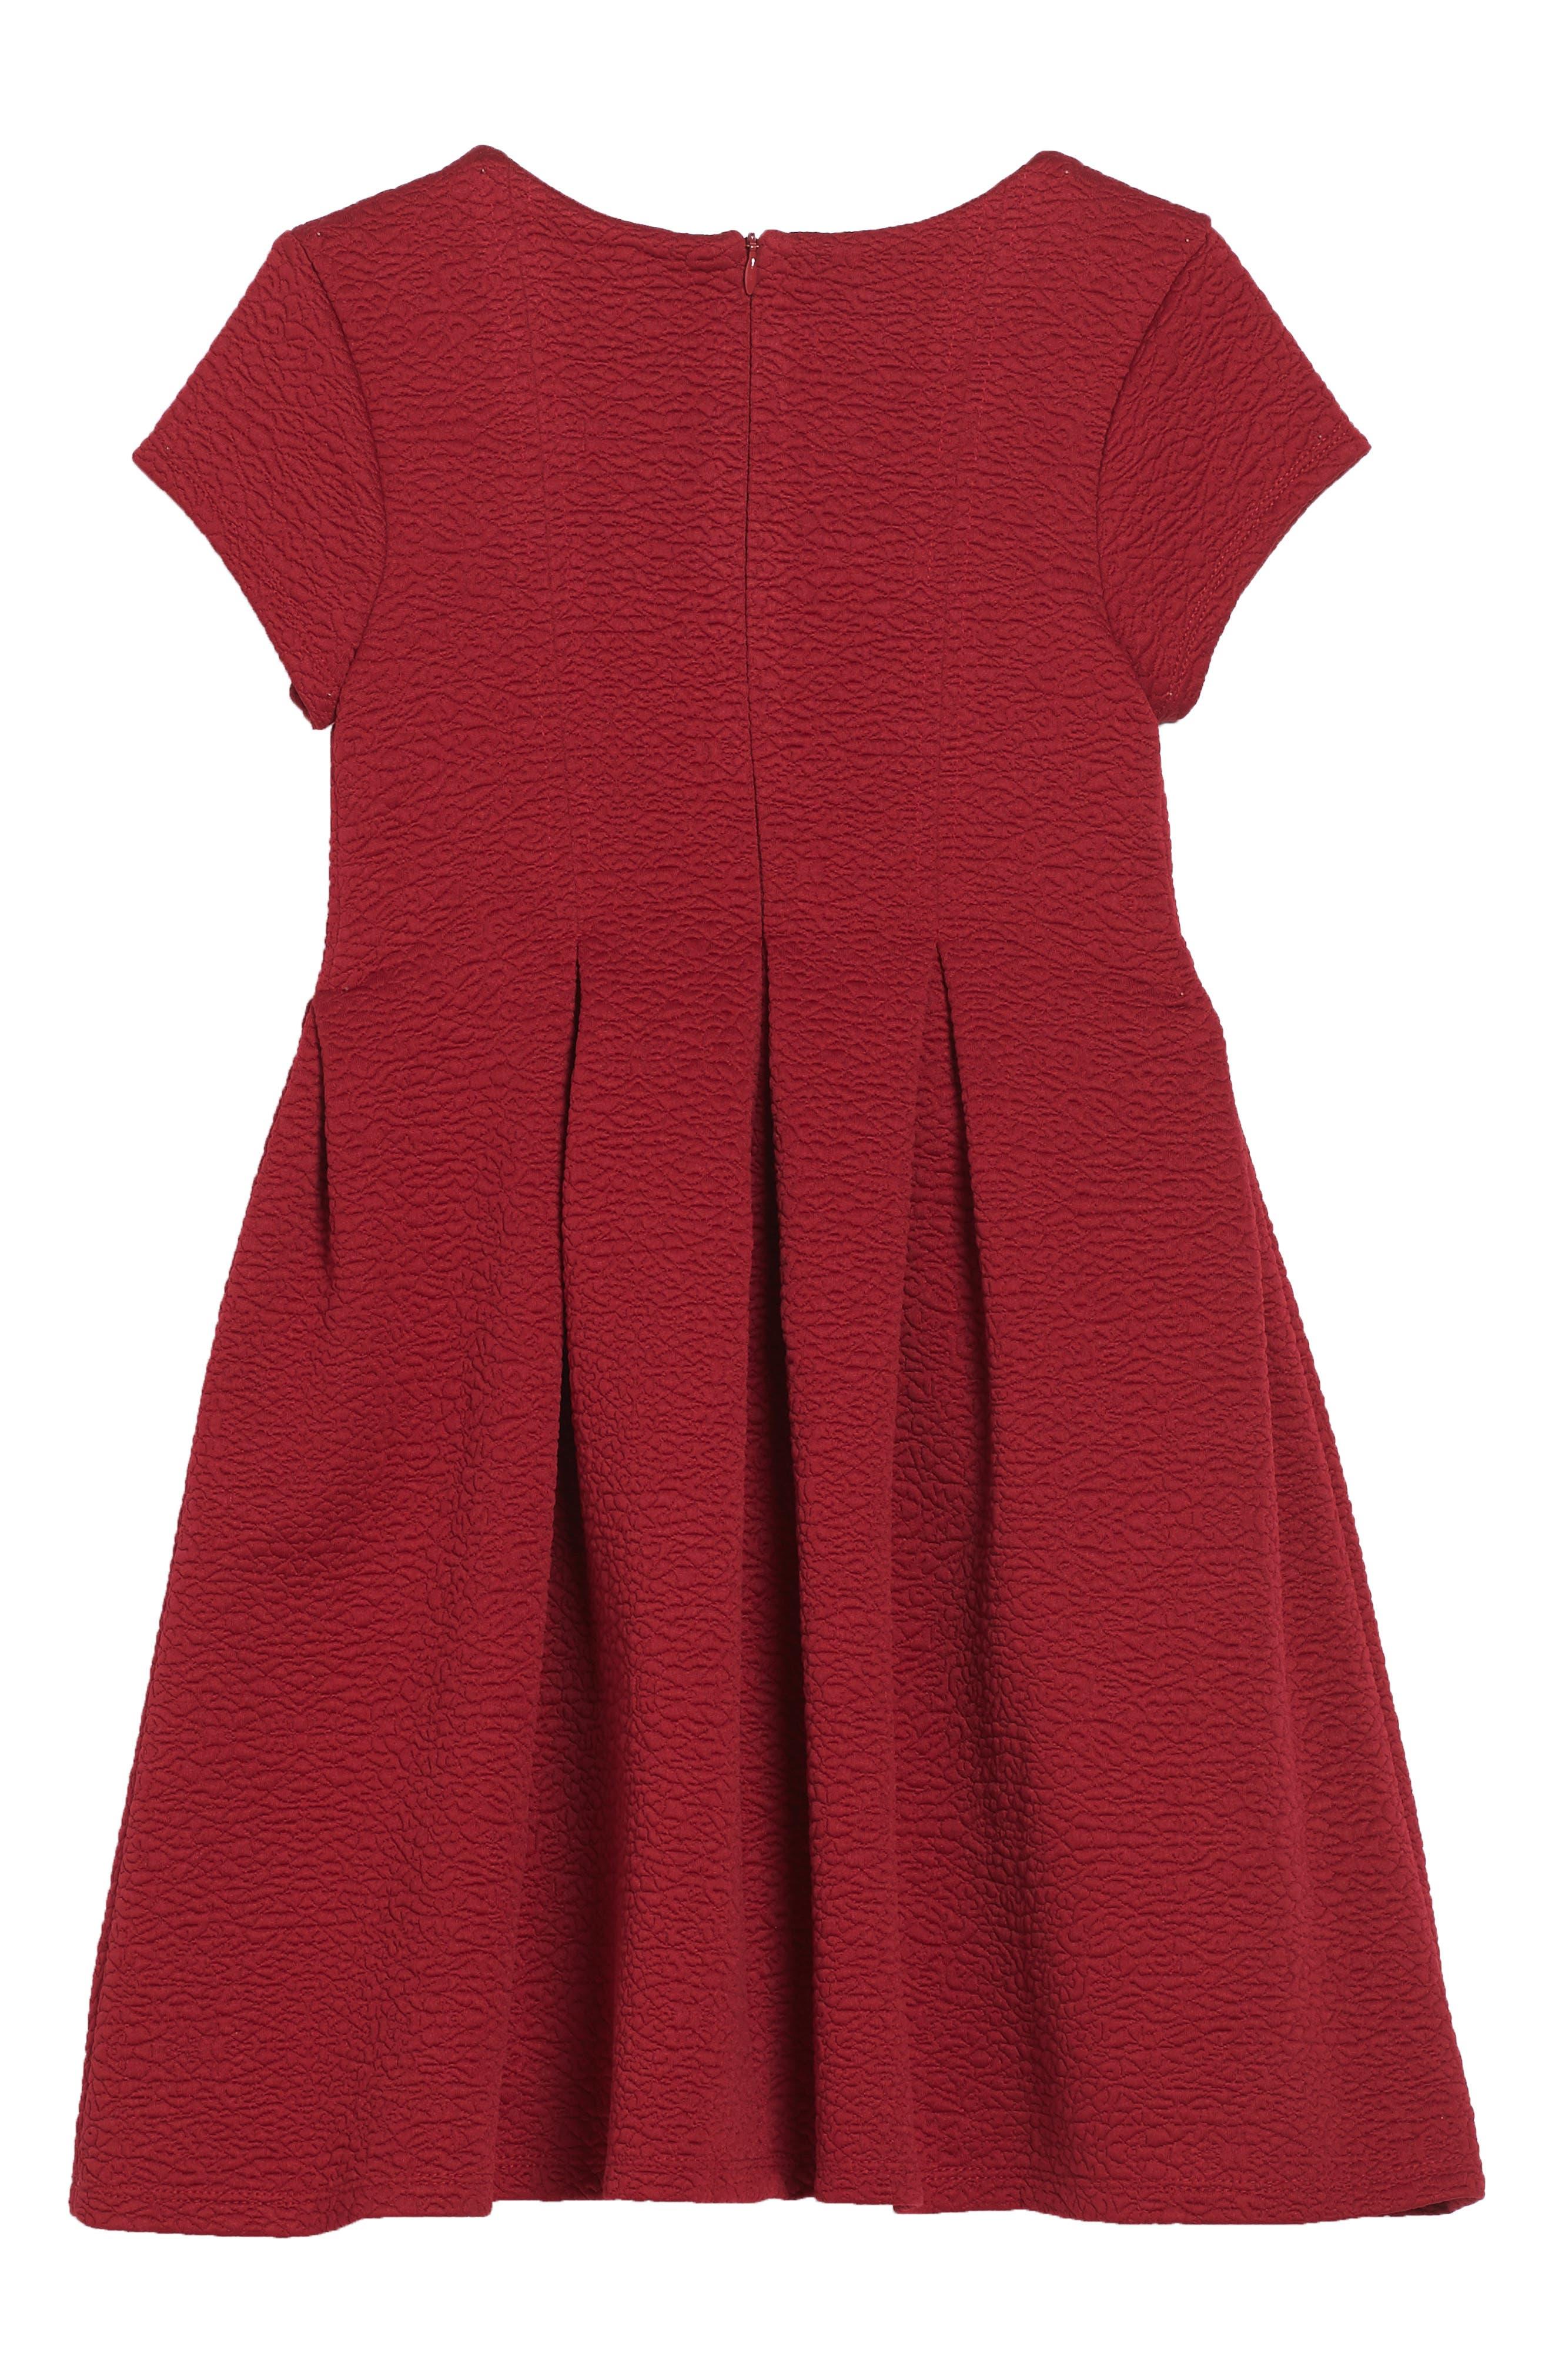 Alternate Image 2  - Iris & Ivy Textured Knit Dress (Toddler Girls, Little Girls & Big Girls)